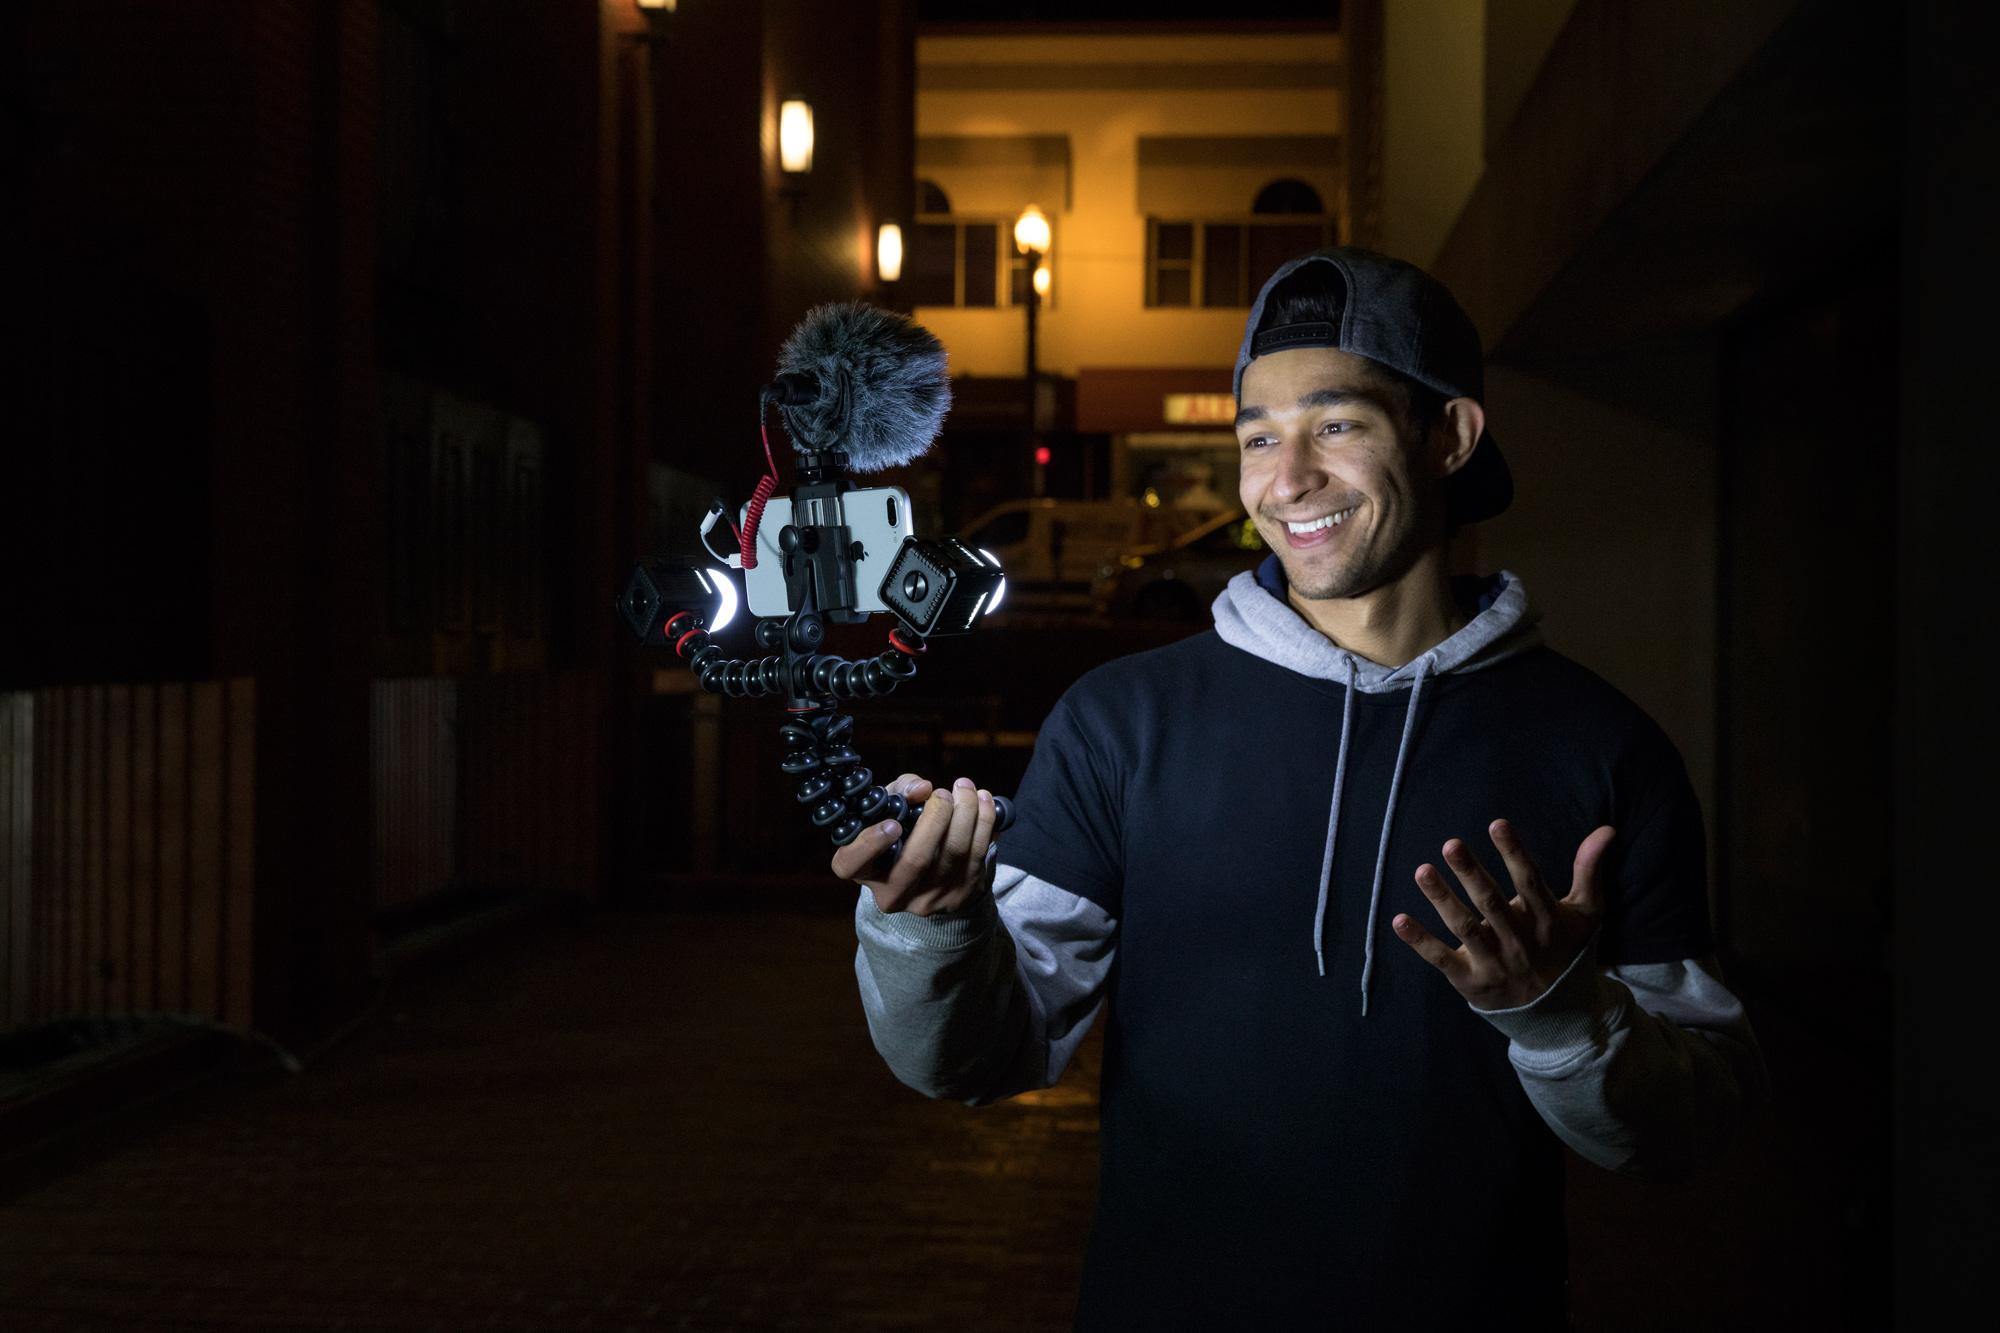 #JOBYAmbassadors Wil Dasovich Wins Vlogger of the Year